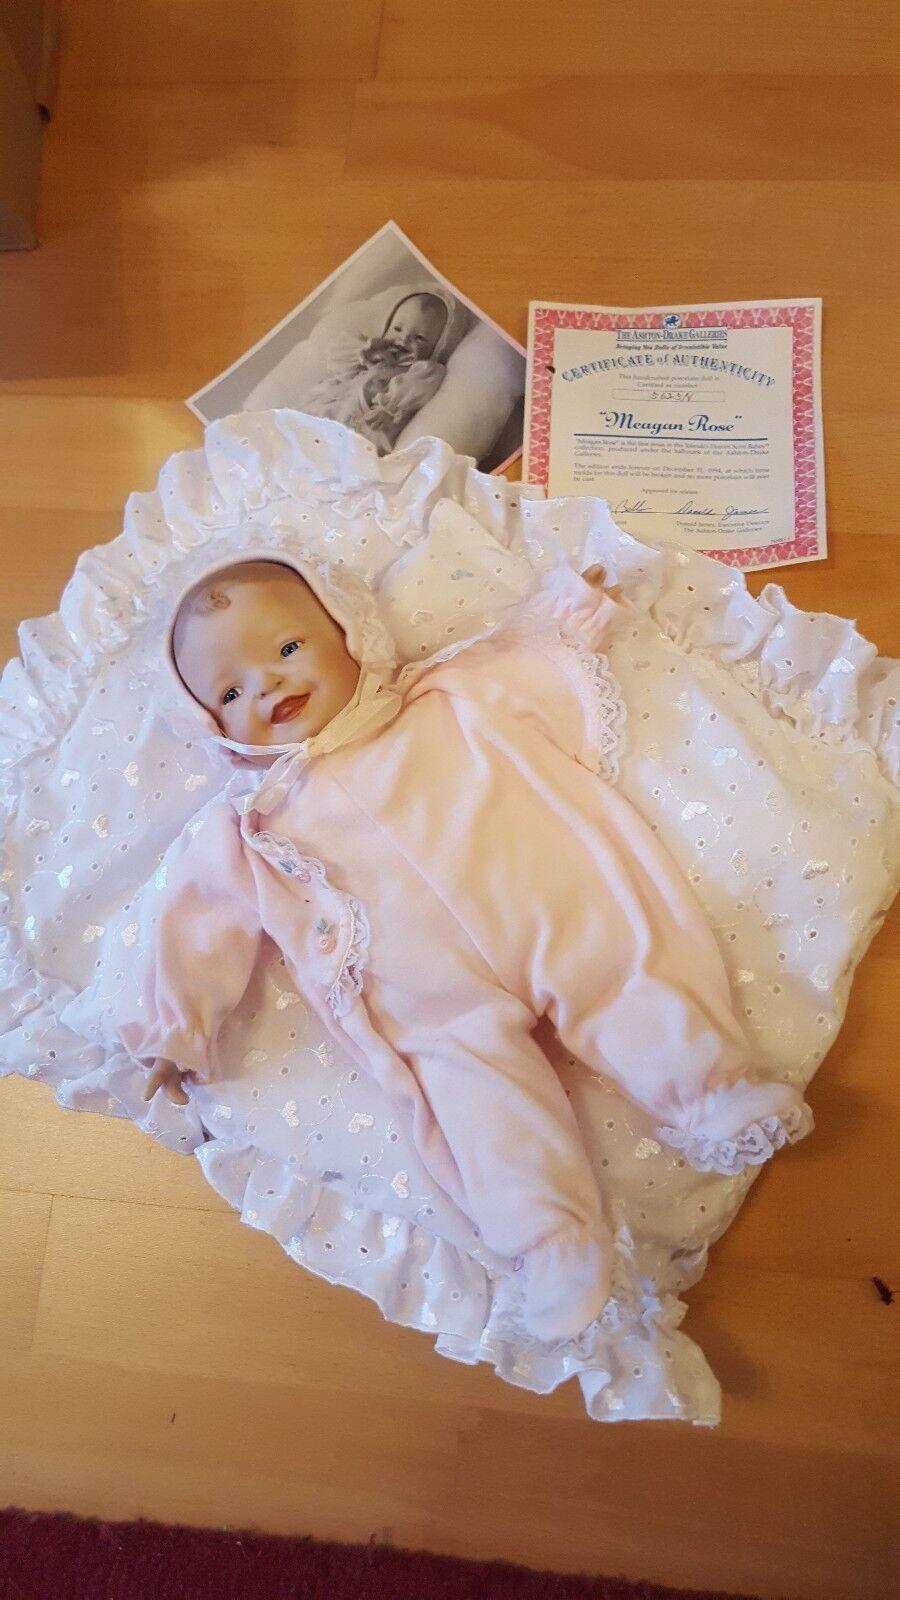 Puppe von Yolanda Bello Megan Rosa The Ashton Baby Baby Baby Topp neuwertig 0ac903